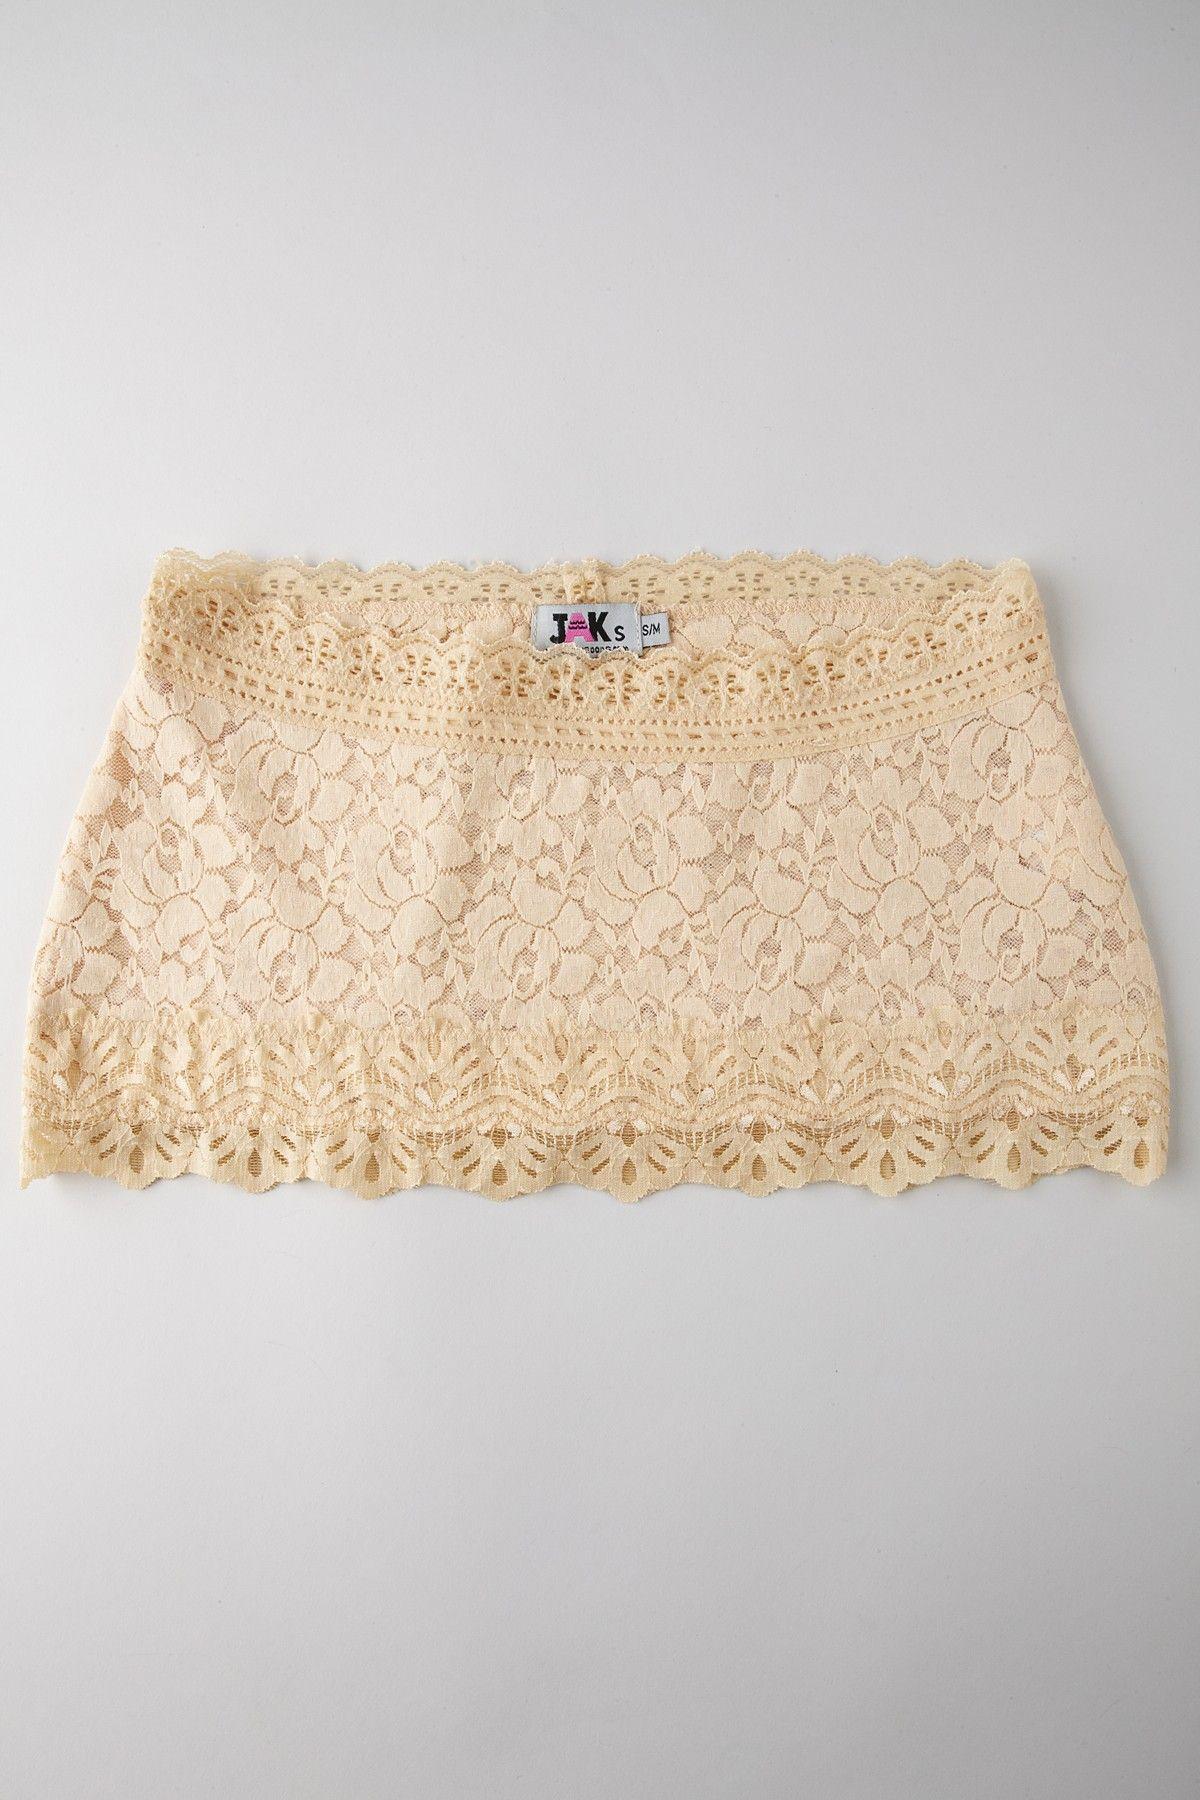 Wholesale lace shirt extender - Shirt Extenders